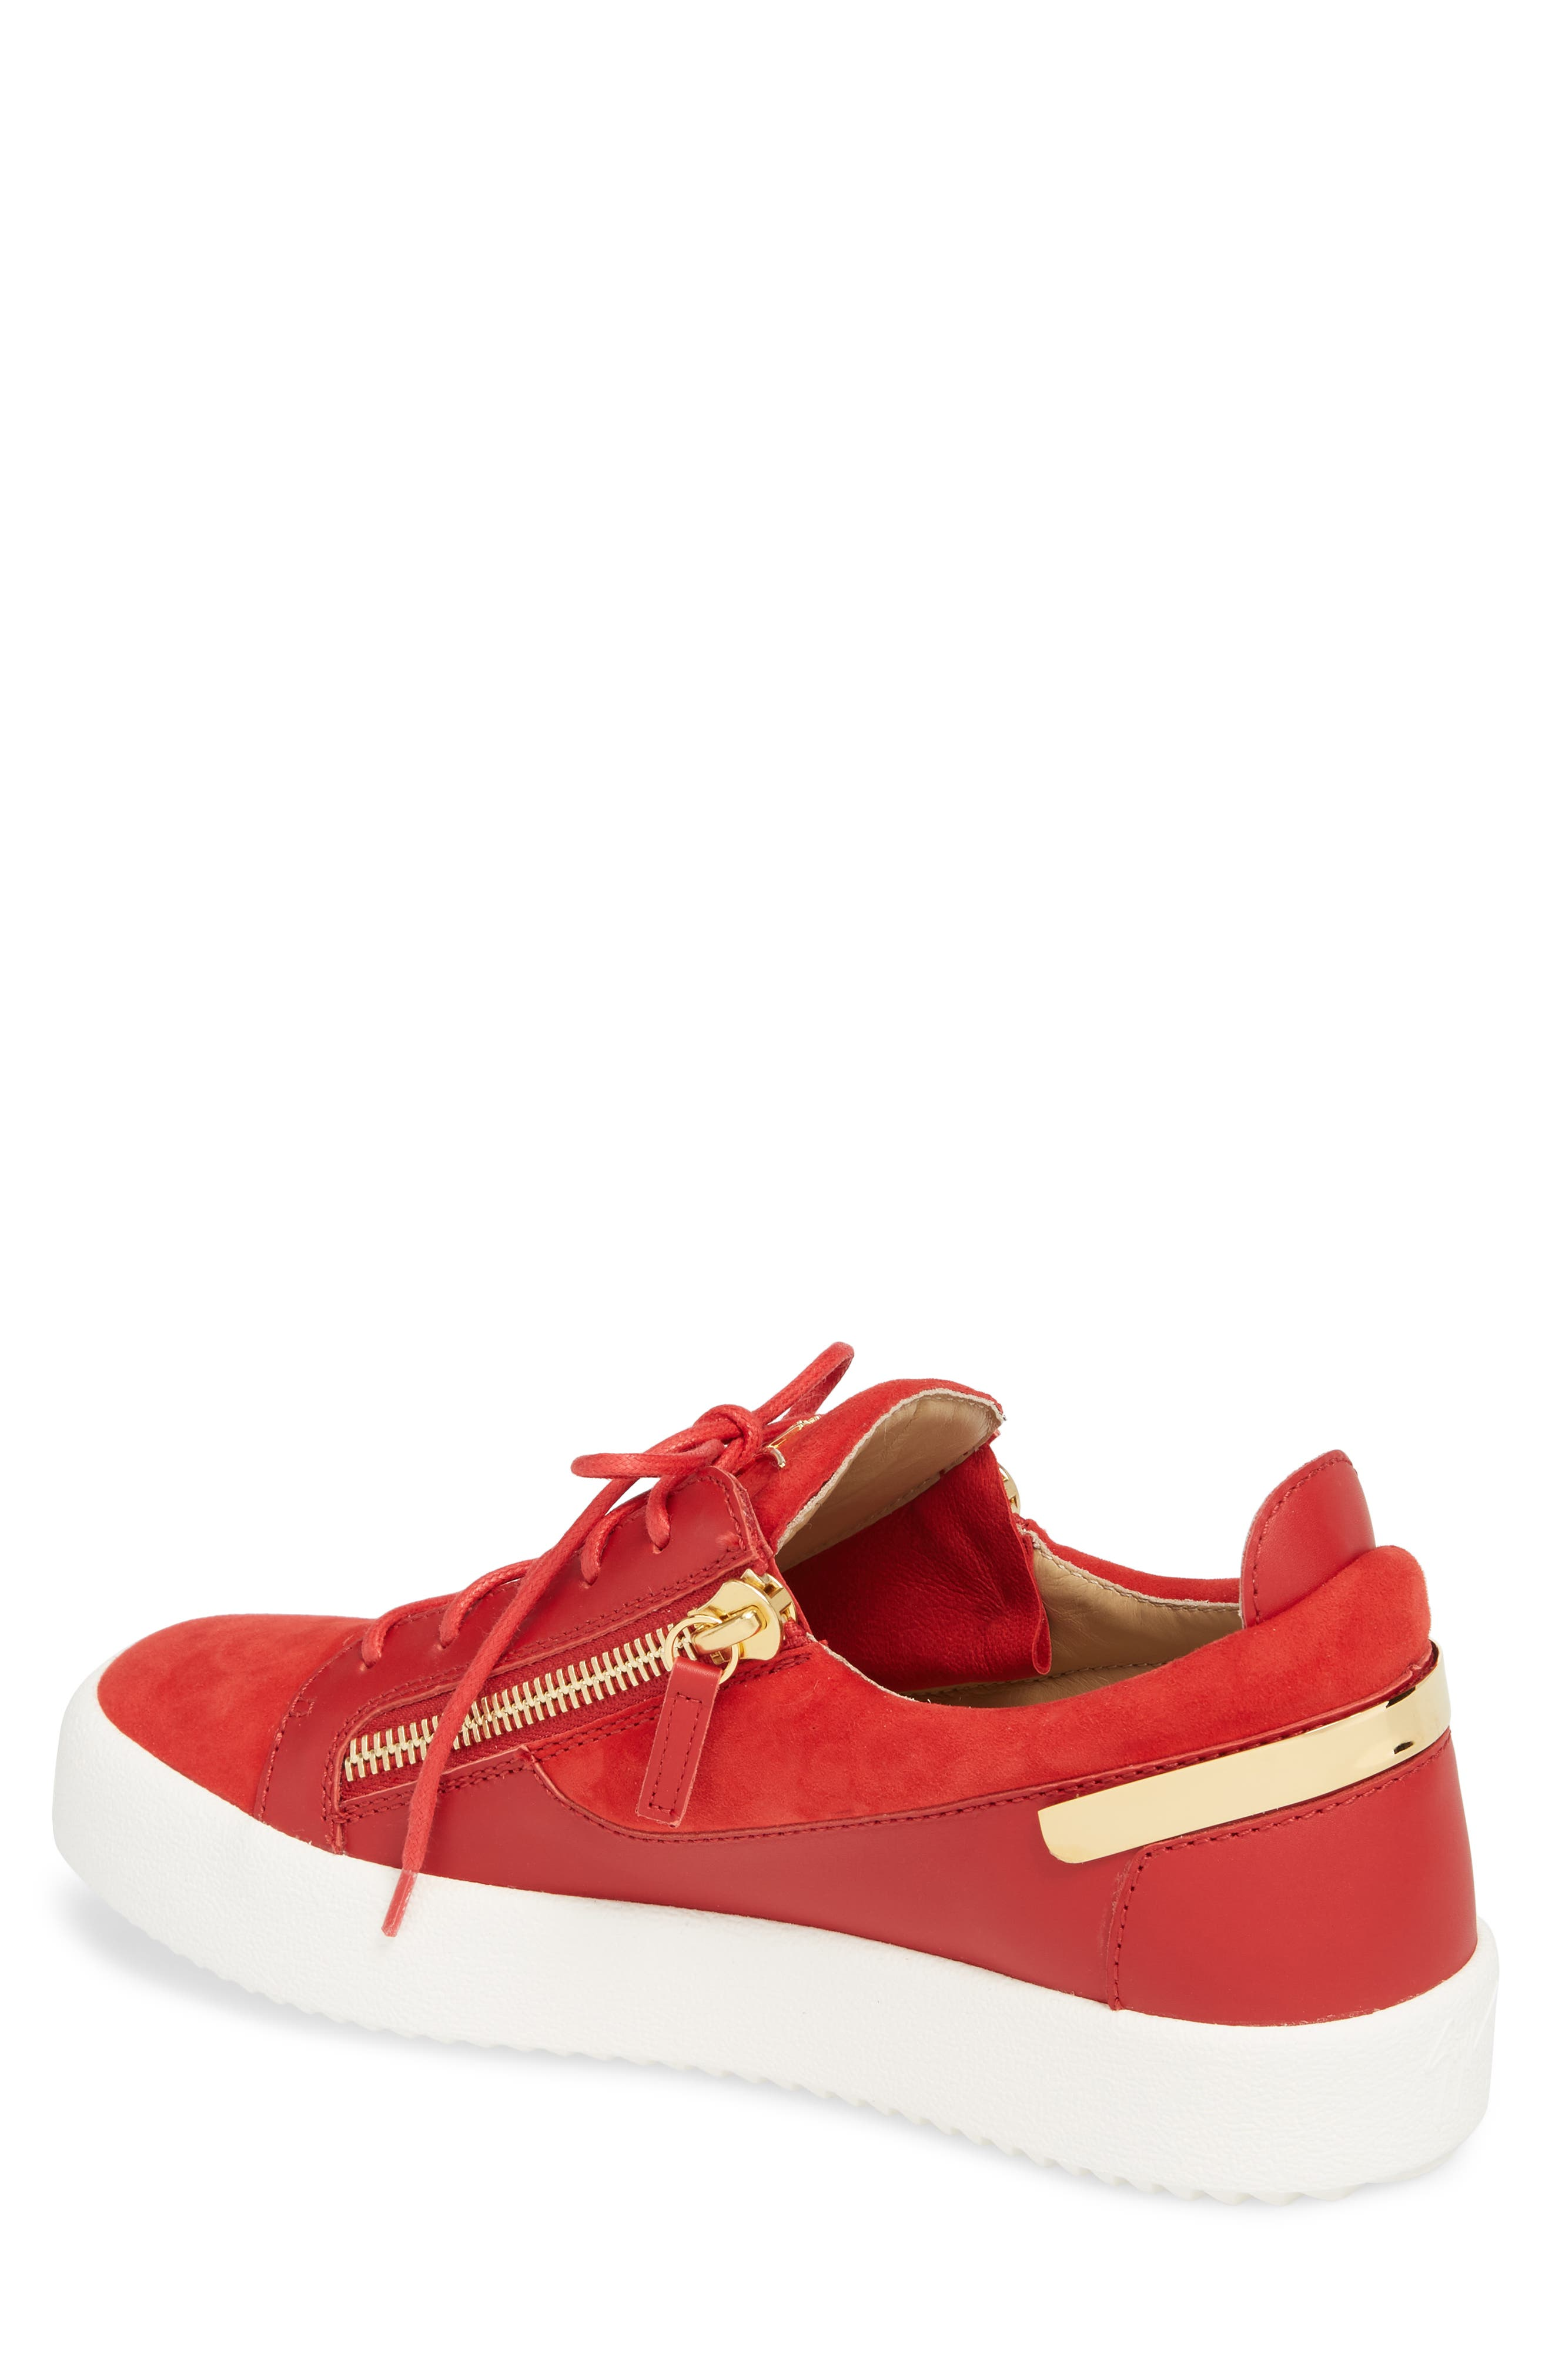 Zip Low Top Sneaker,                             Alternate thumbnail 2, color,                             Fiamma